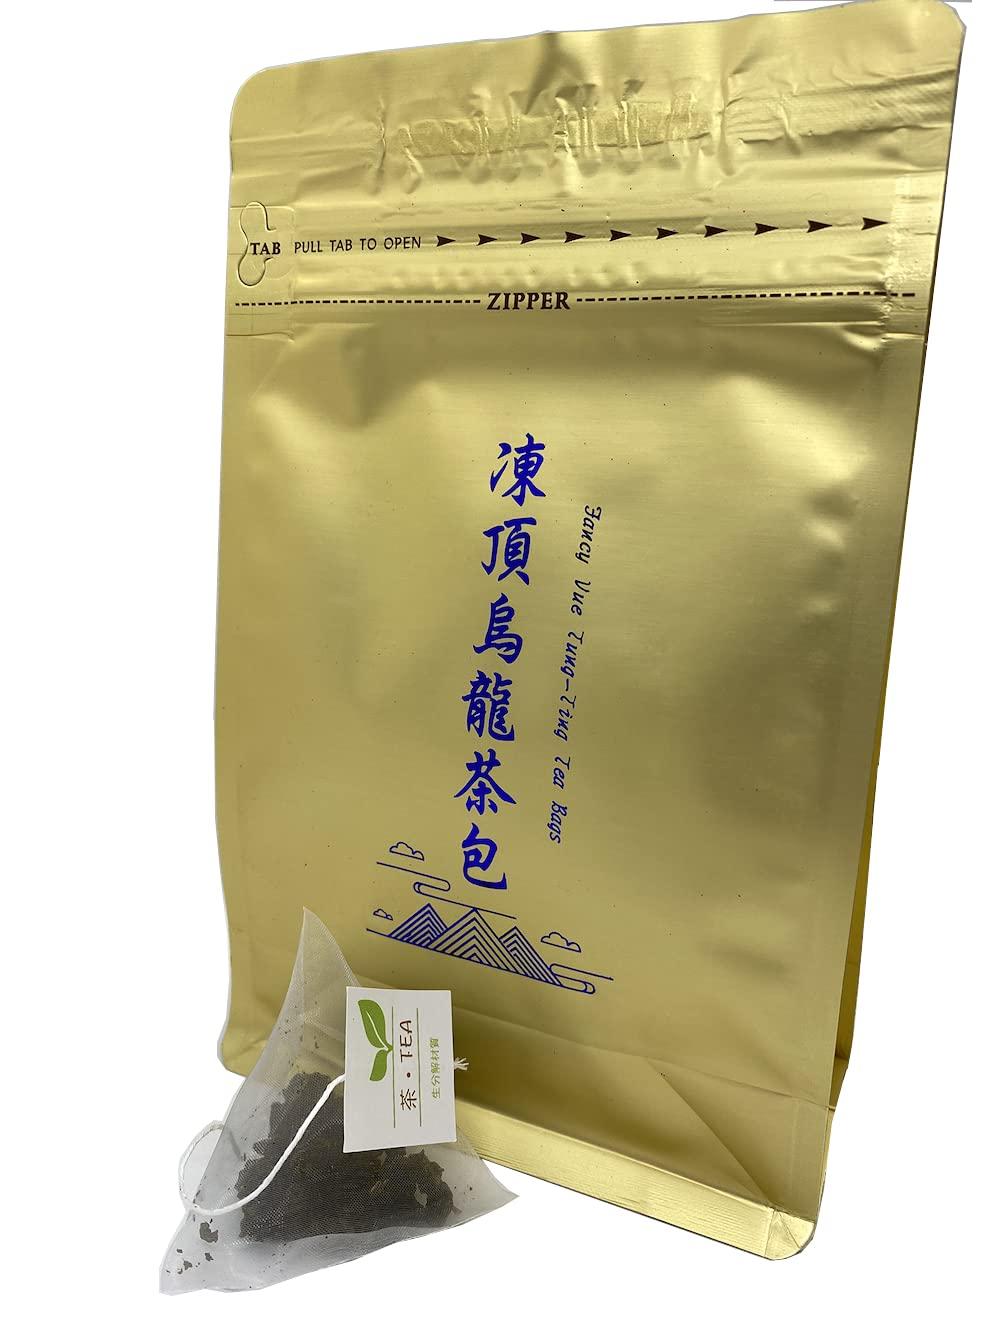 Fancy Vue Tung-Ting Oolong Direct sale of manufacturer Kansas City Mall Organic Handmade Bags Tea